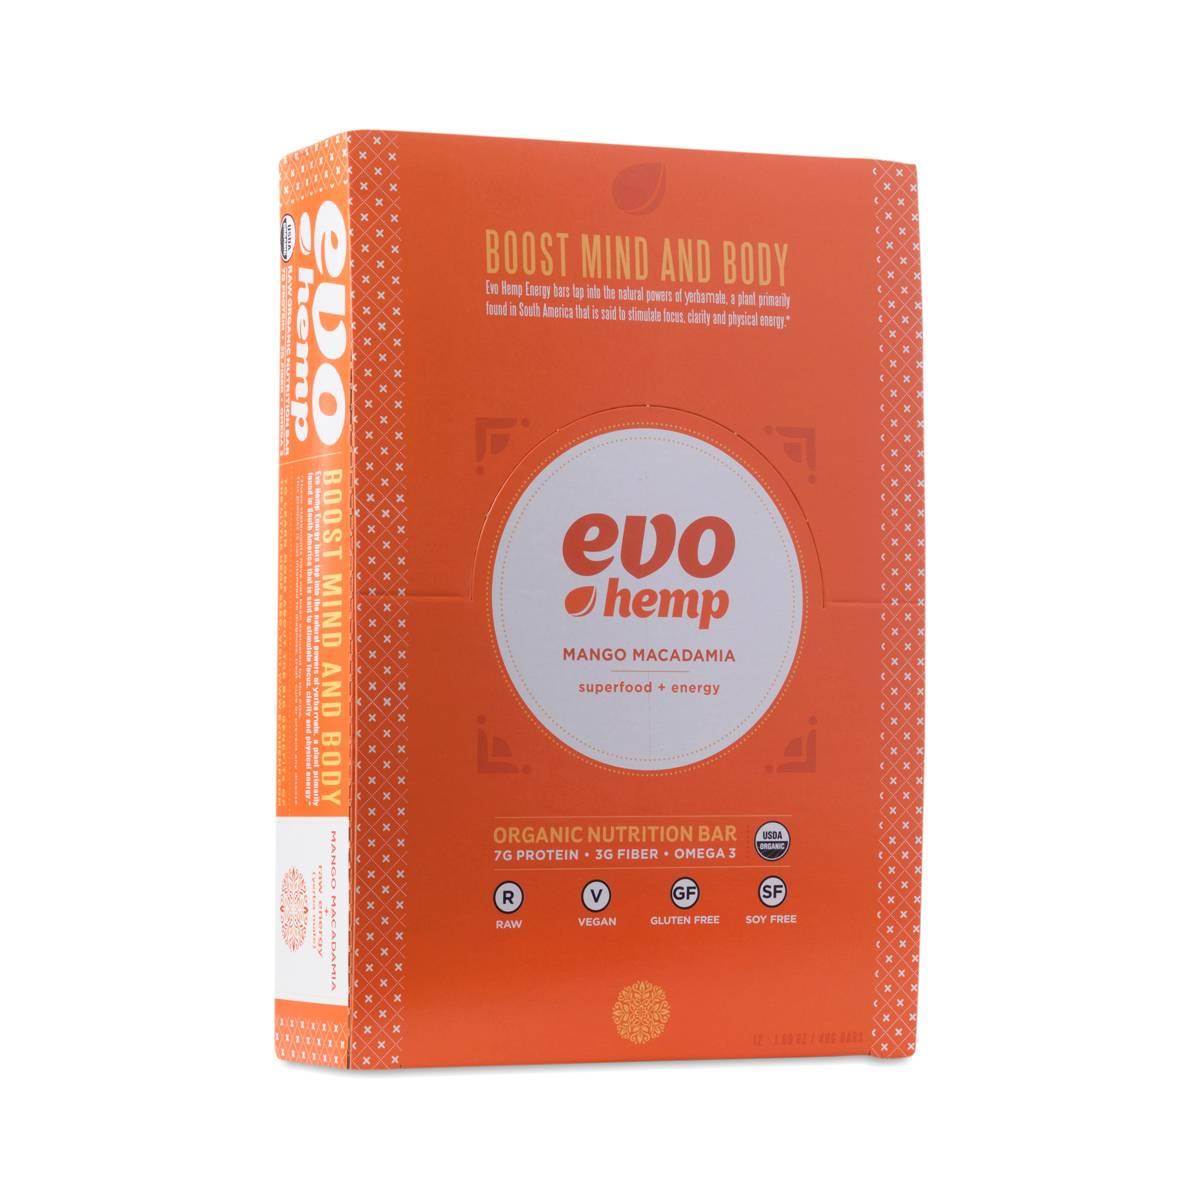 Mango Macadamia Energy Bar by Evo Hemp - Thrive Market